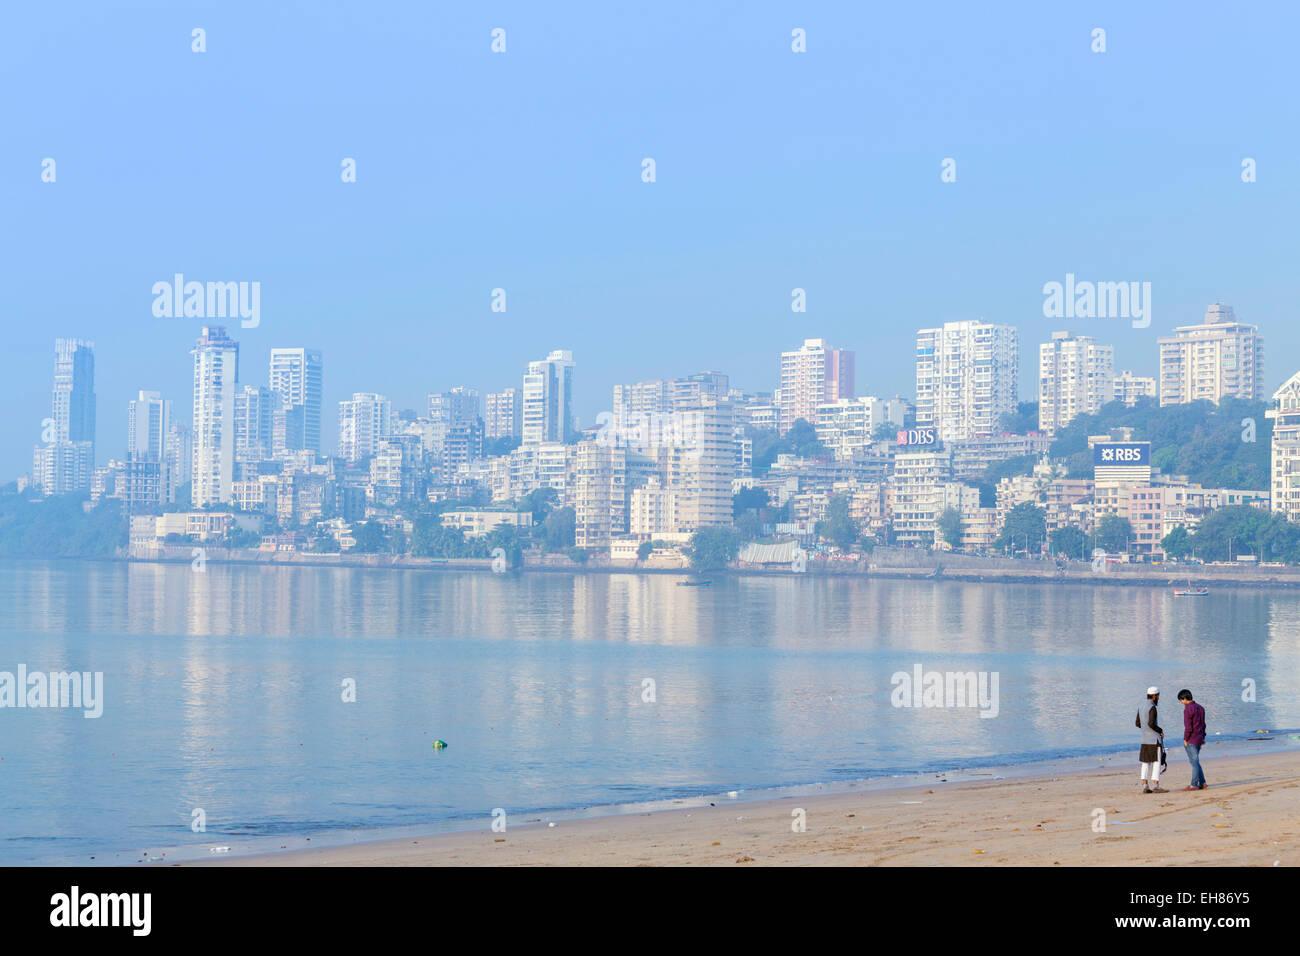 A Muslim and a Hindu man talking on Chowpatty beach, Mumbai, Maharashtra, India, Asia - Stock Image